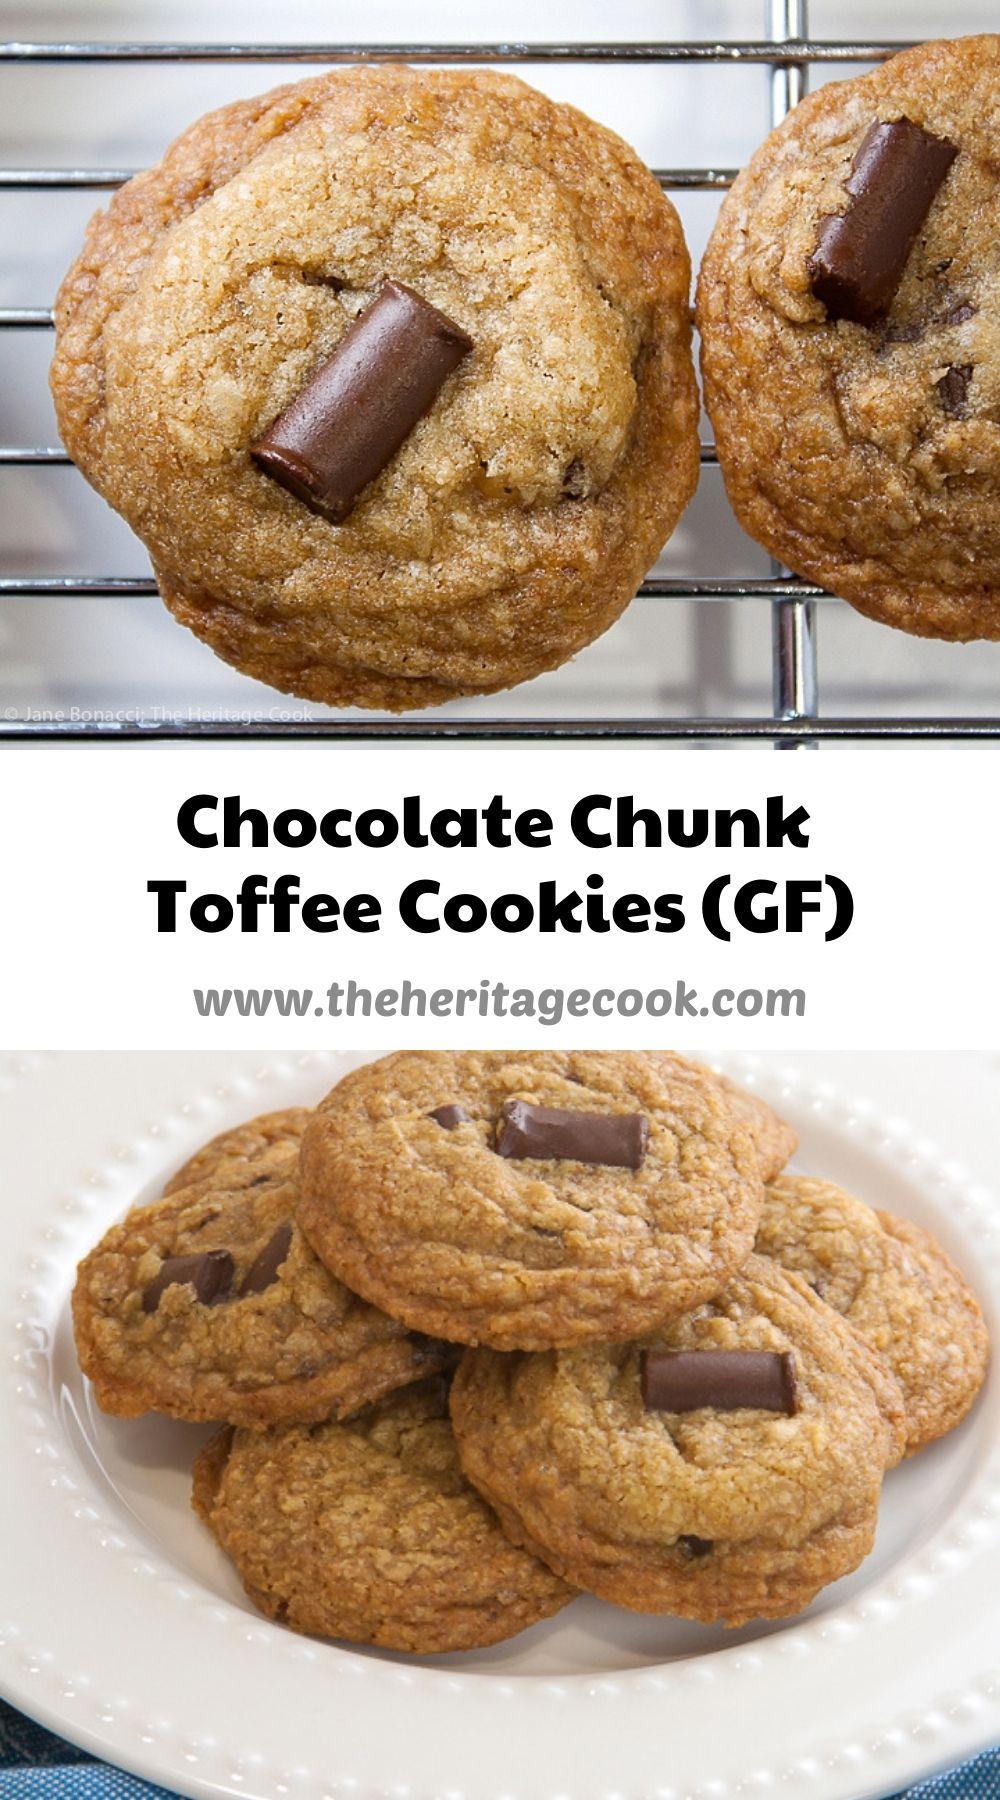 Gluten Free Chocolate Chunk Toffee Cookies © 2021 Jane Bonacci, The Heritage Cook